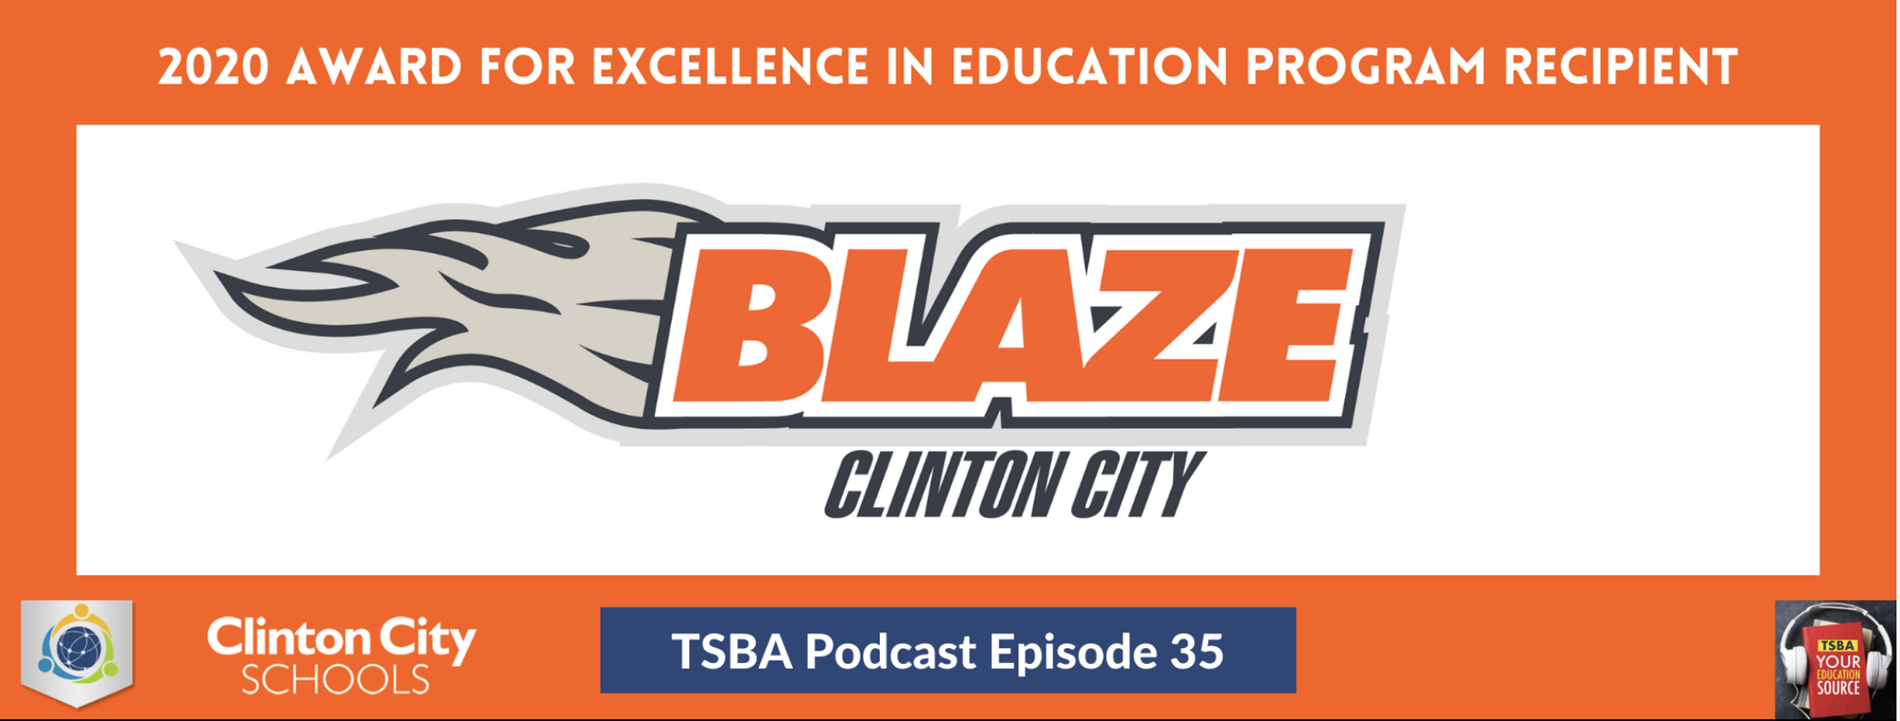 Link to TSBA podcast